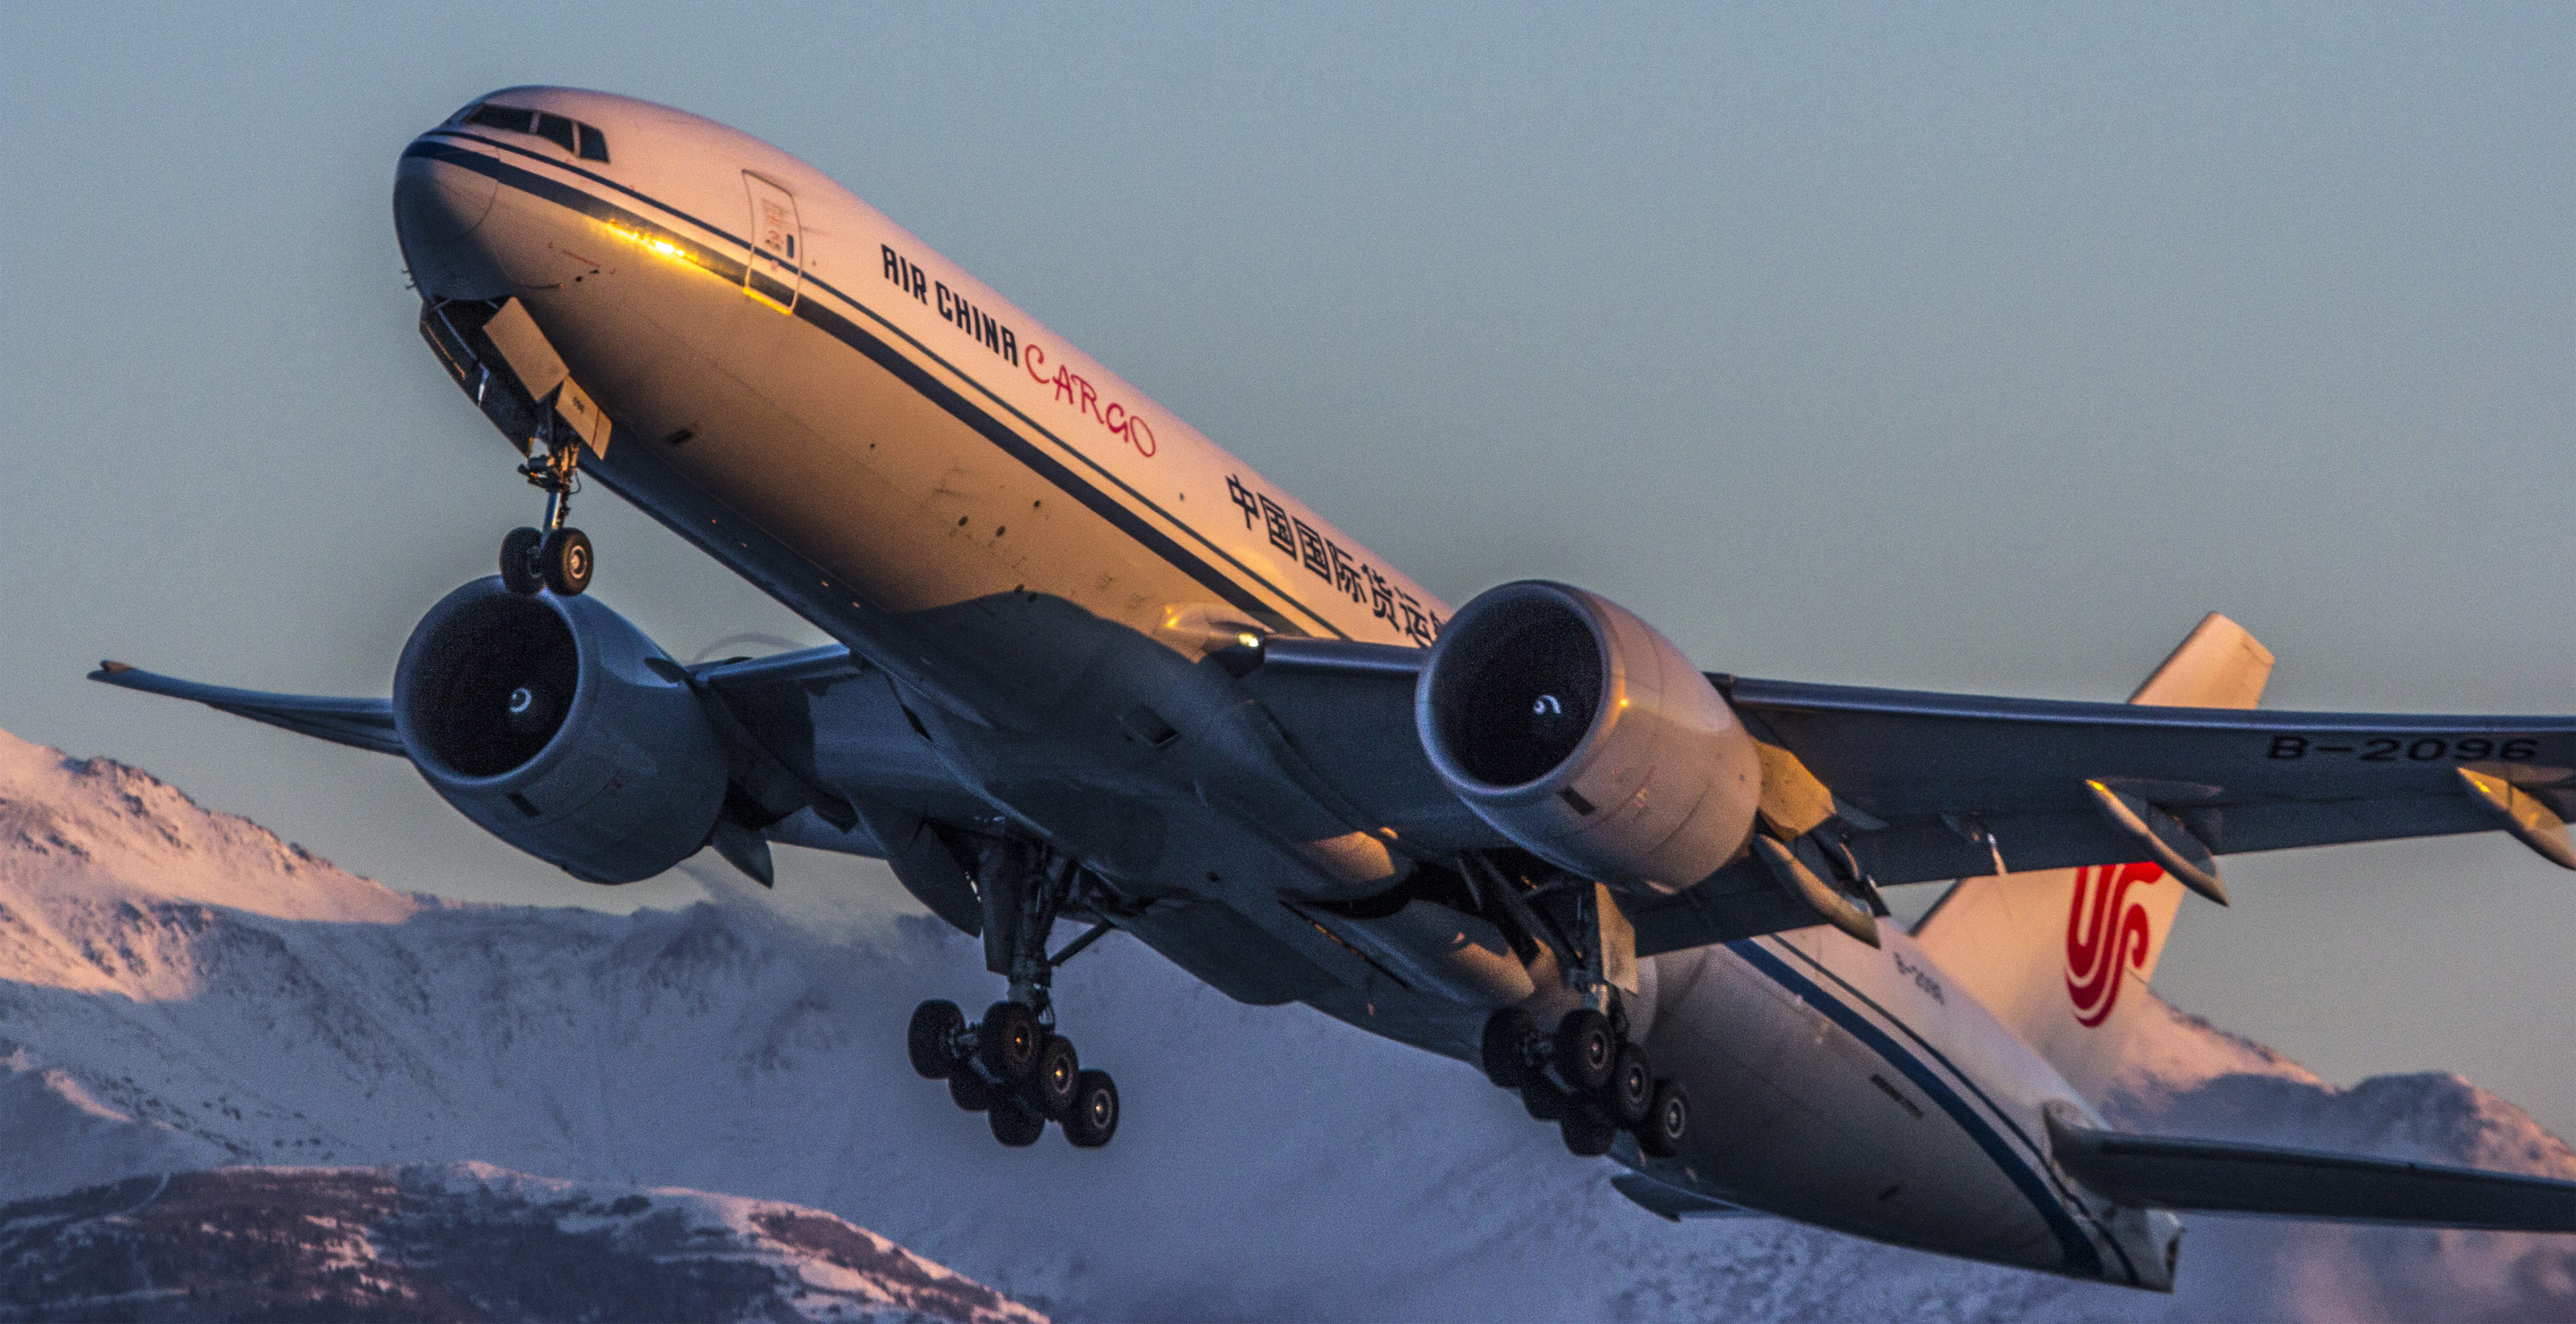 Cathay Pacific jet aircraft, aviation photography, Alaskafoto